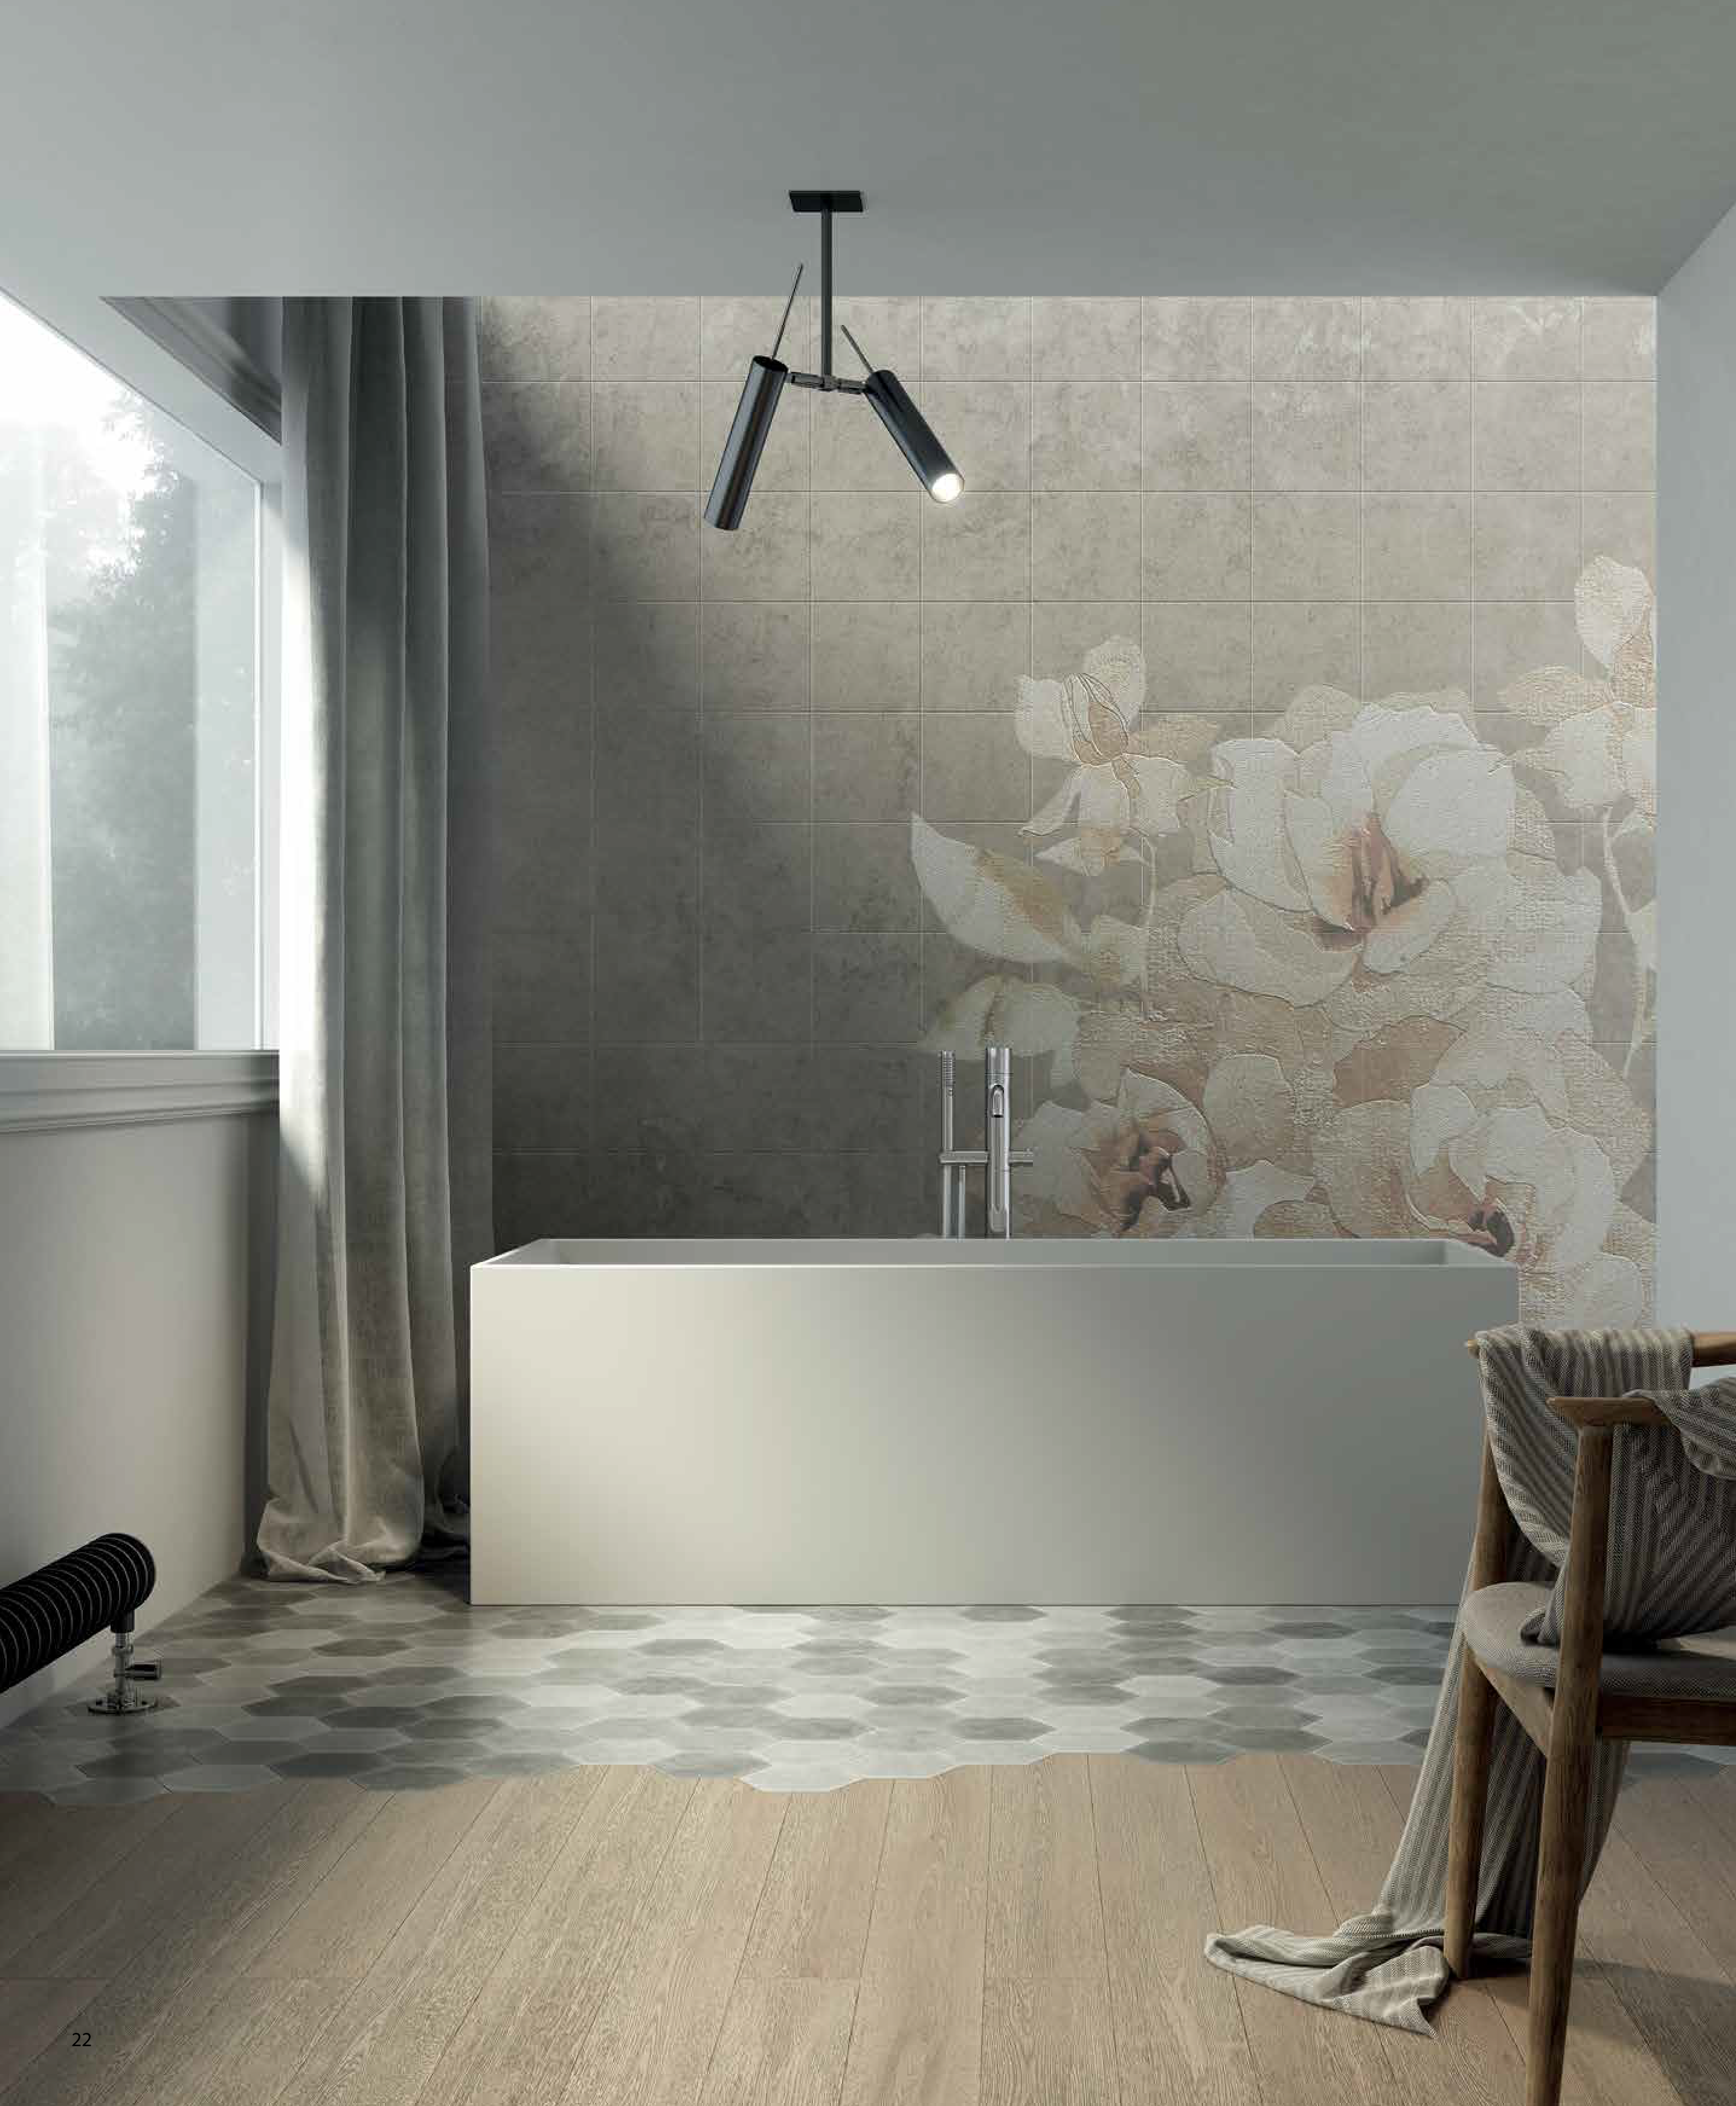 baignoire l o gamme salle de bain espagne decore id. Black Bedroom Furniture Sets. Home Design Ideas